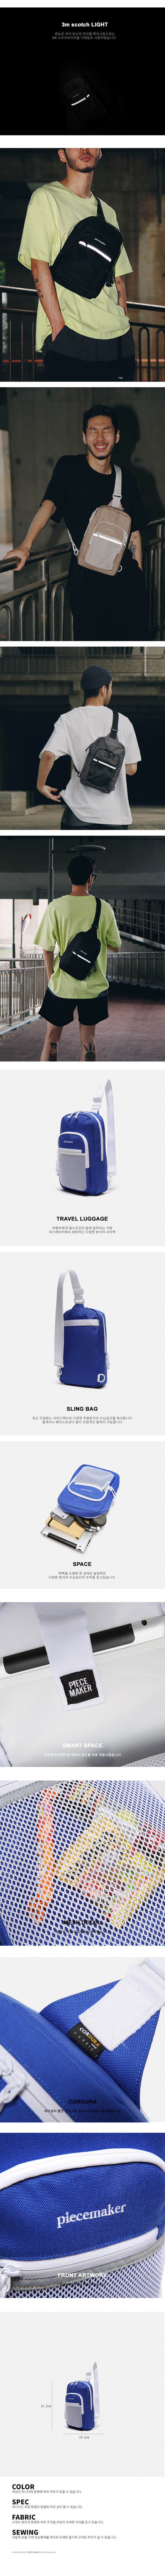 CLASSIC CORDURA SLING BAG (BLUE)